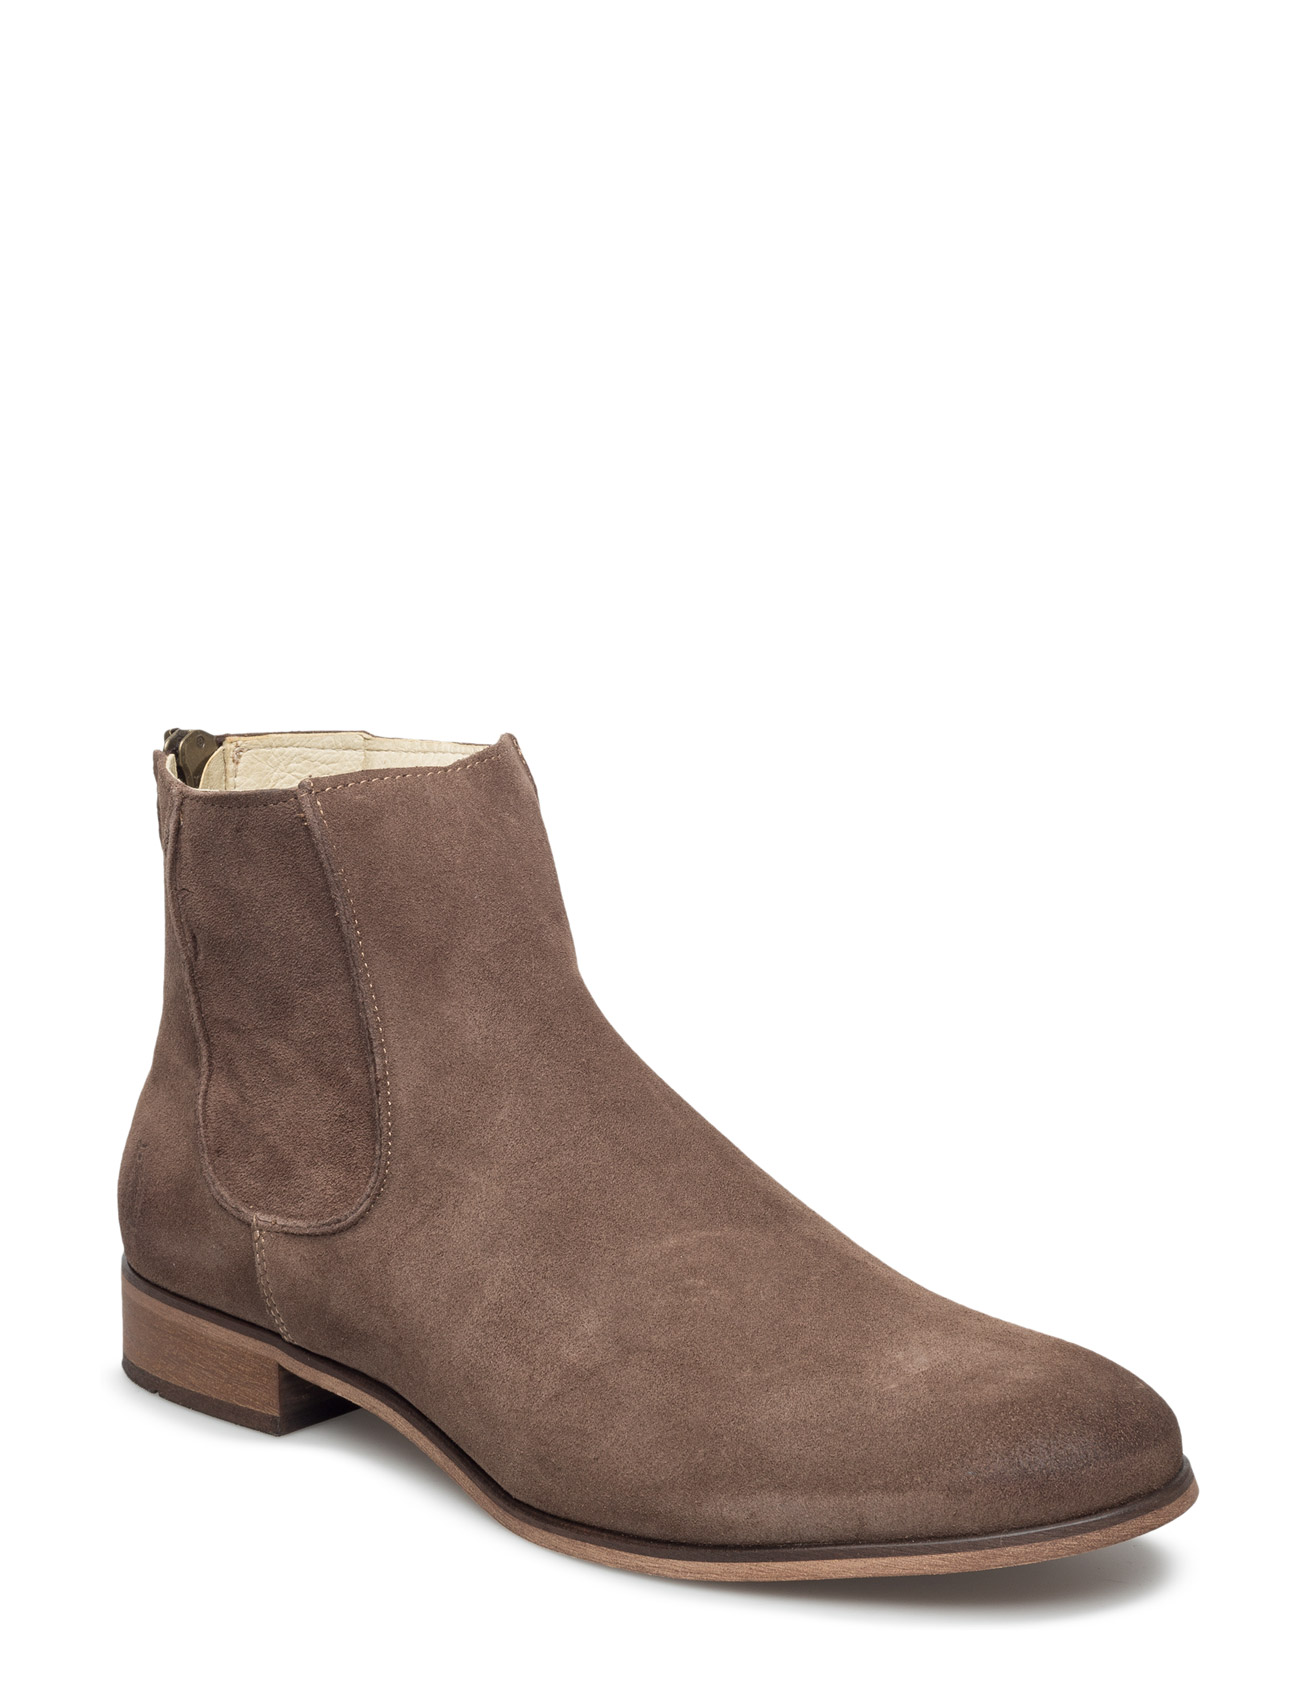 David S Shoe The Bear Støvler til Herrer i Taupe